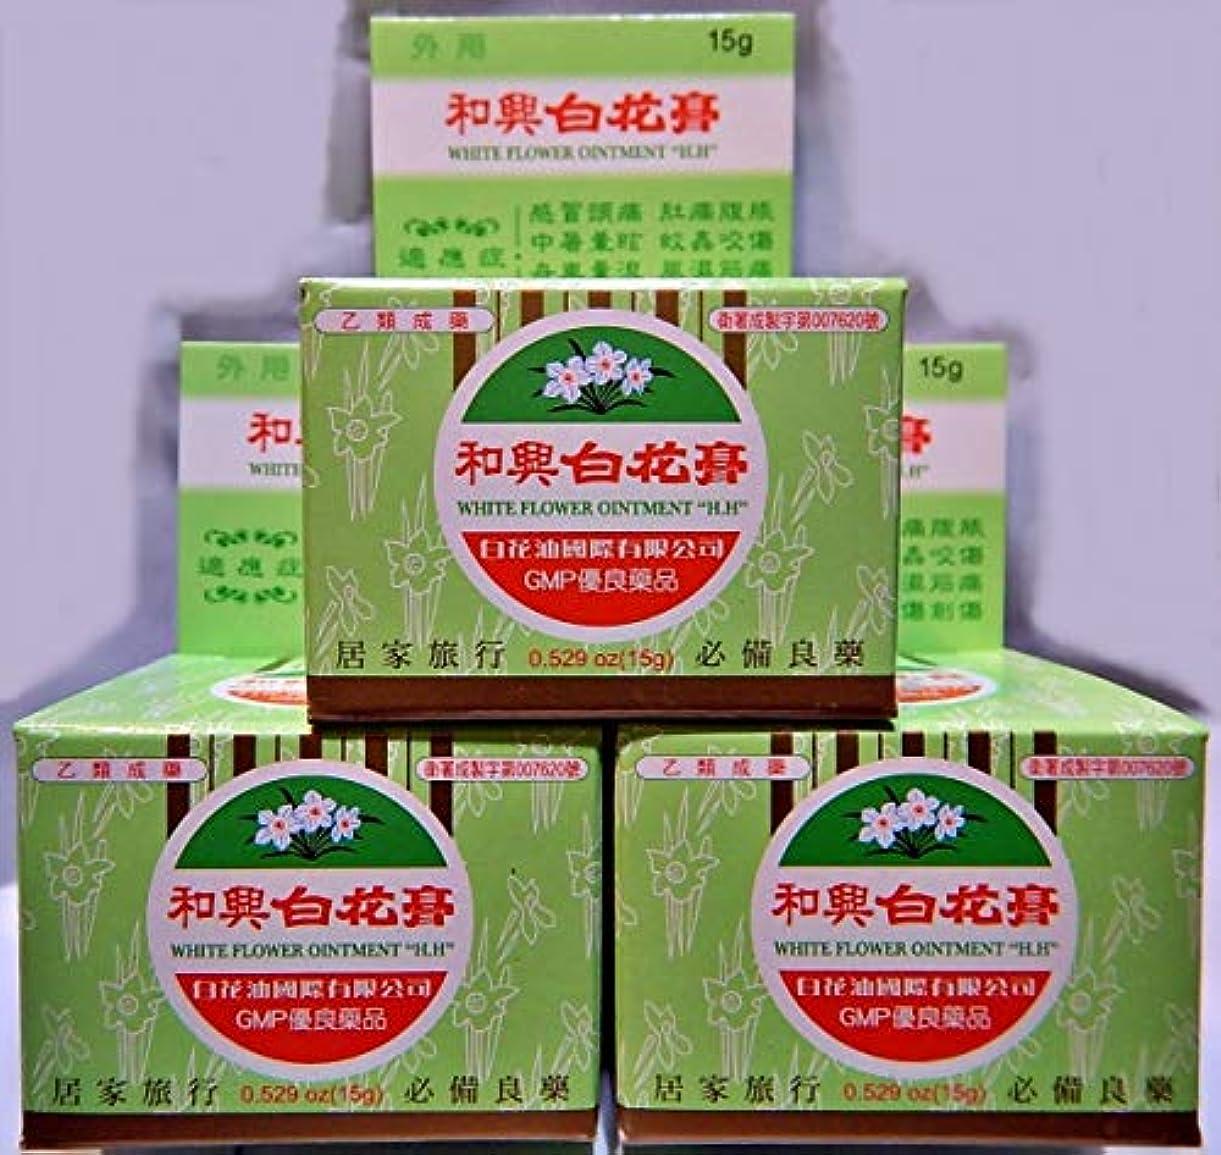 火炎素朴な成人期《和興》白花膏 15g(白花油軟膏タイプ)× 3個《台湾 お土産》 [並行輸入品]